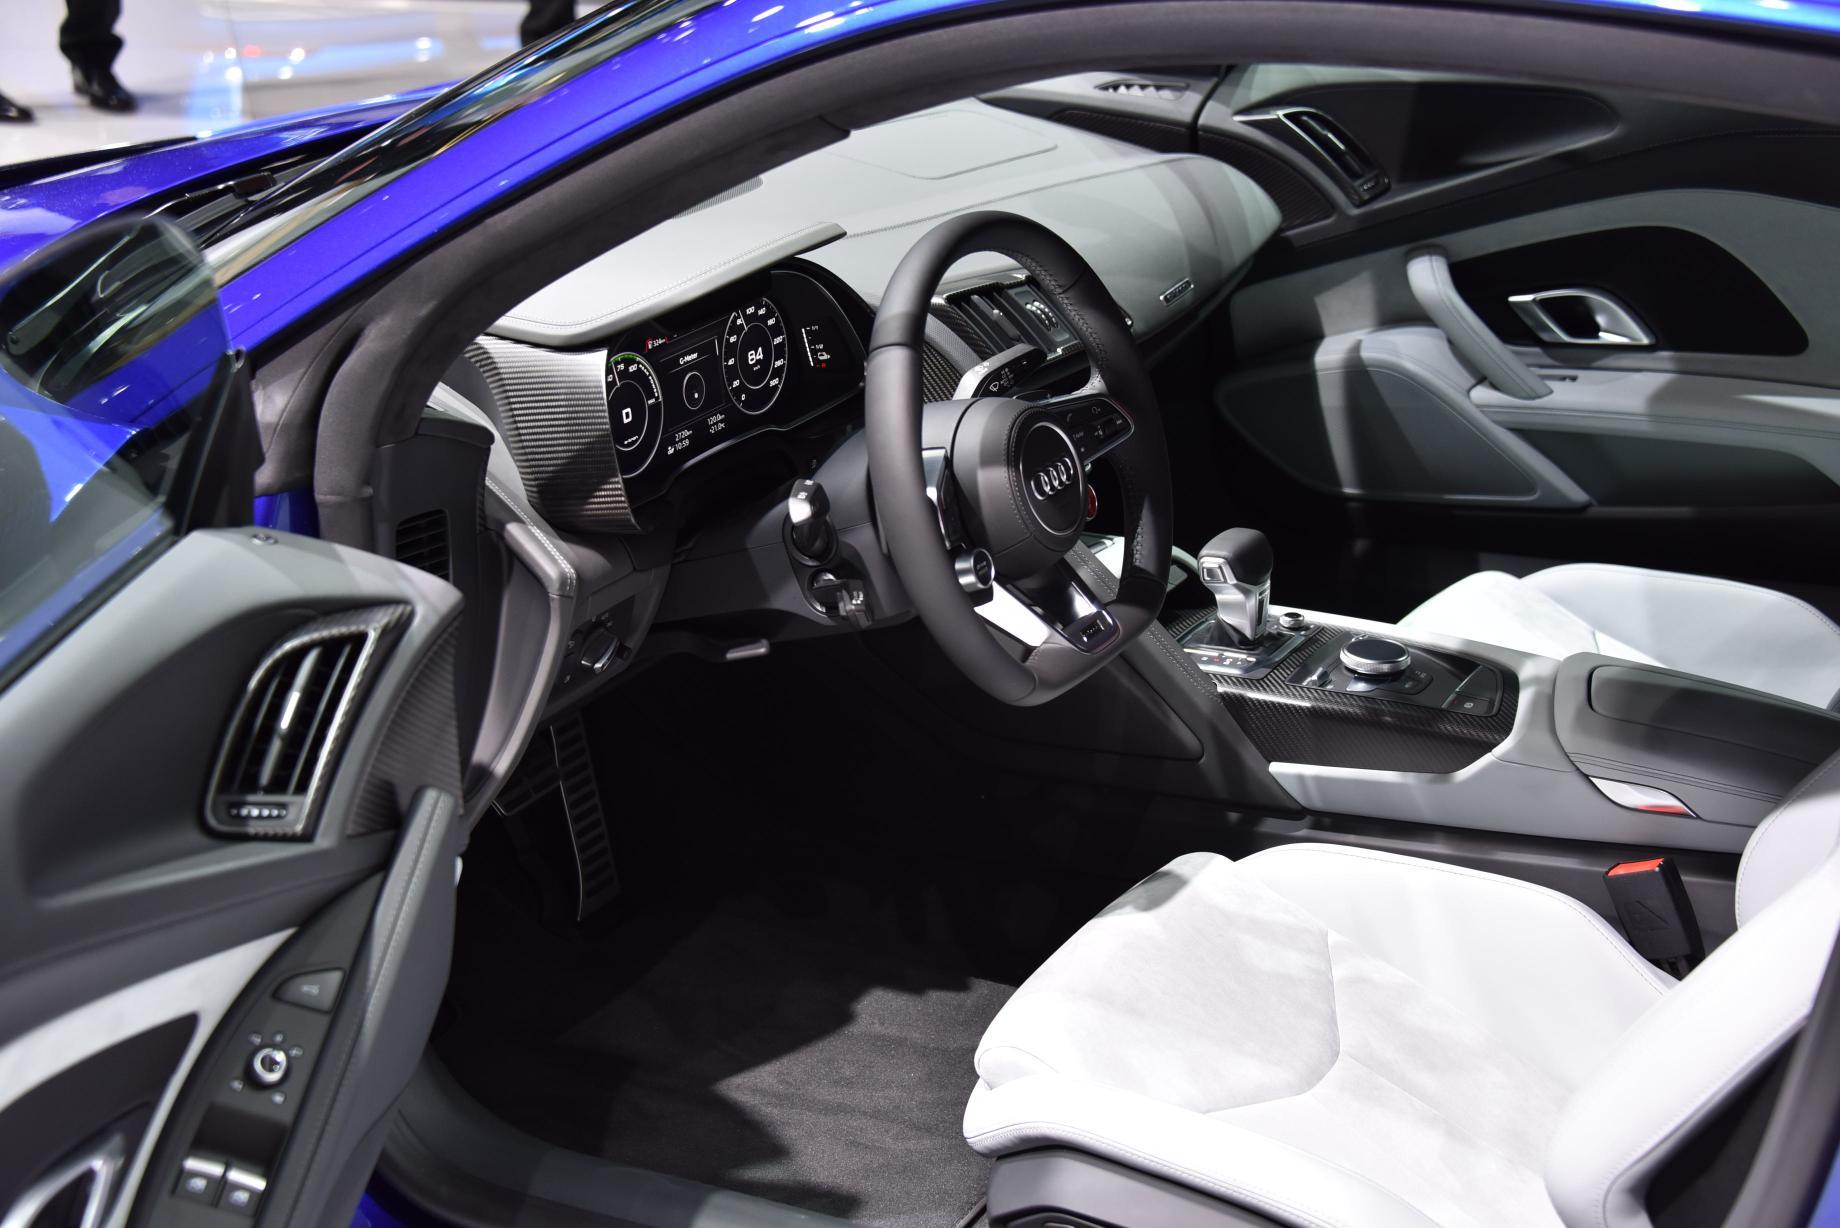 2016 Audi R8 e-tron Weighs a Hefty 1,840 kg, Same as Lexus RC F - autoevolution